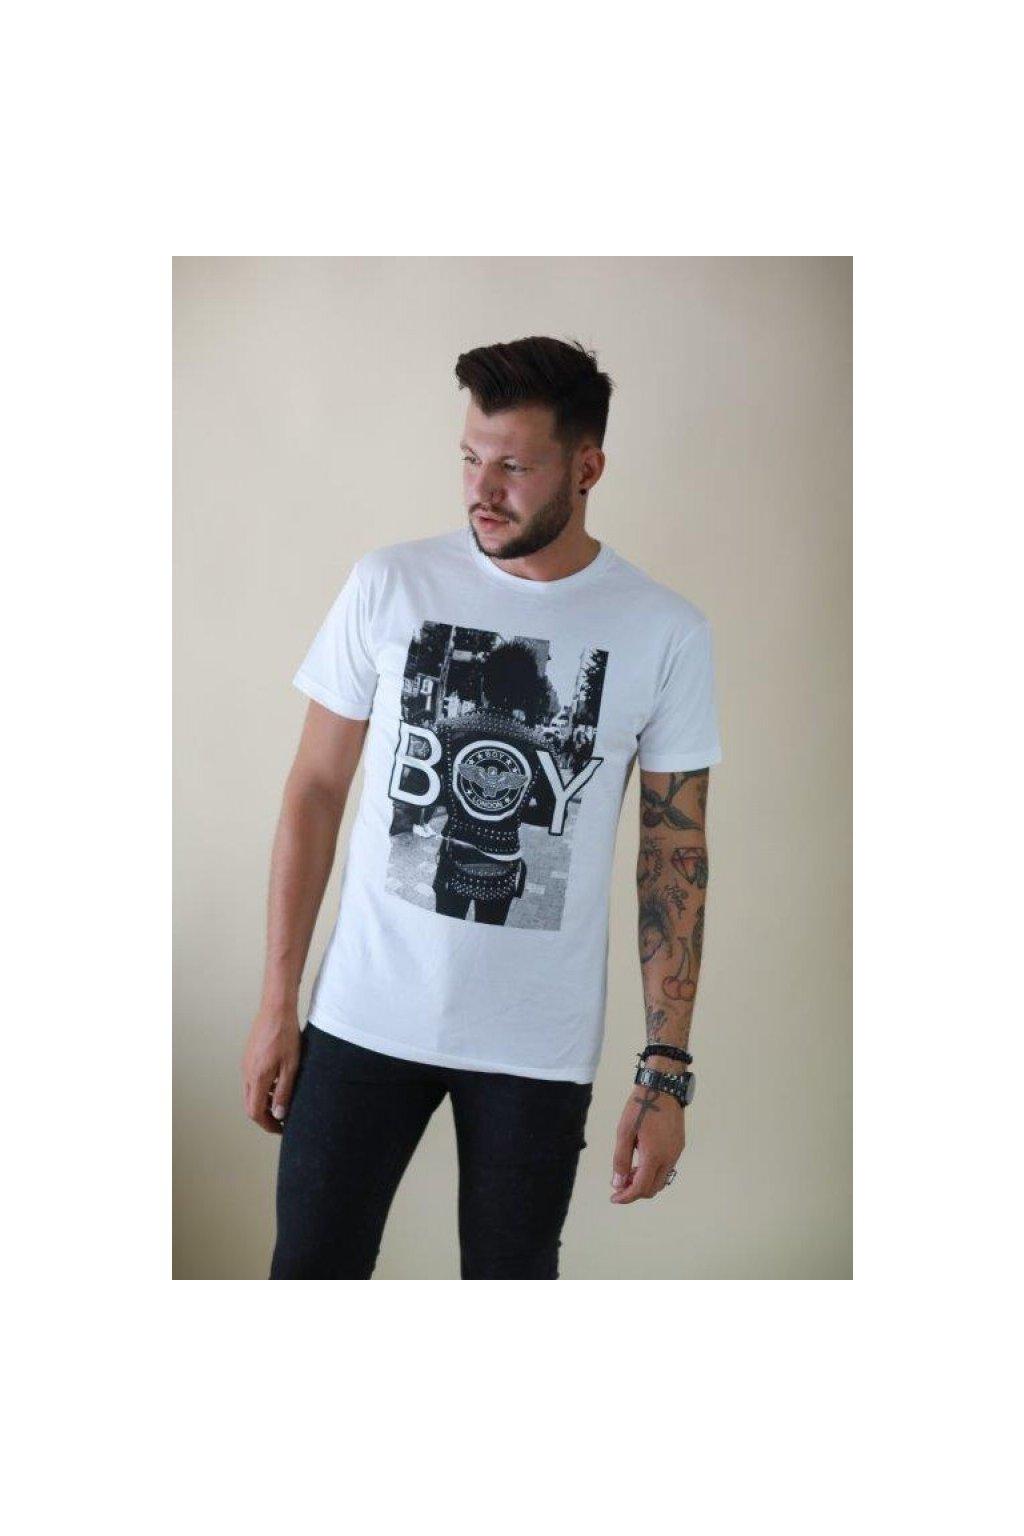 Tričko Boy London - s fotkou (Velikost Velikost XL)